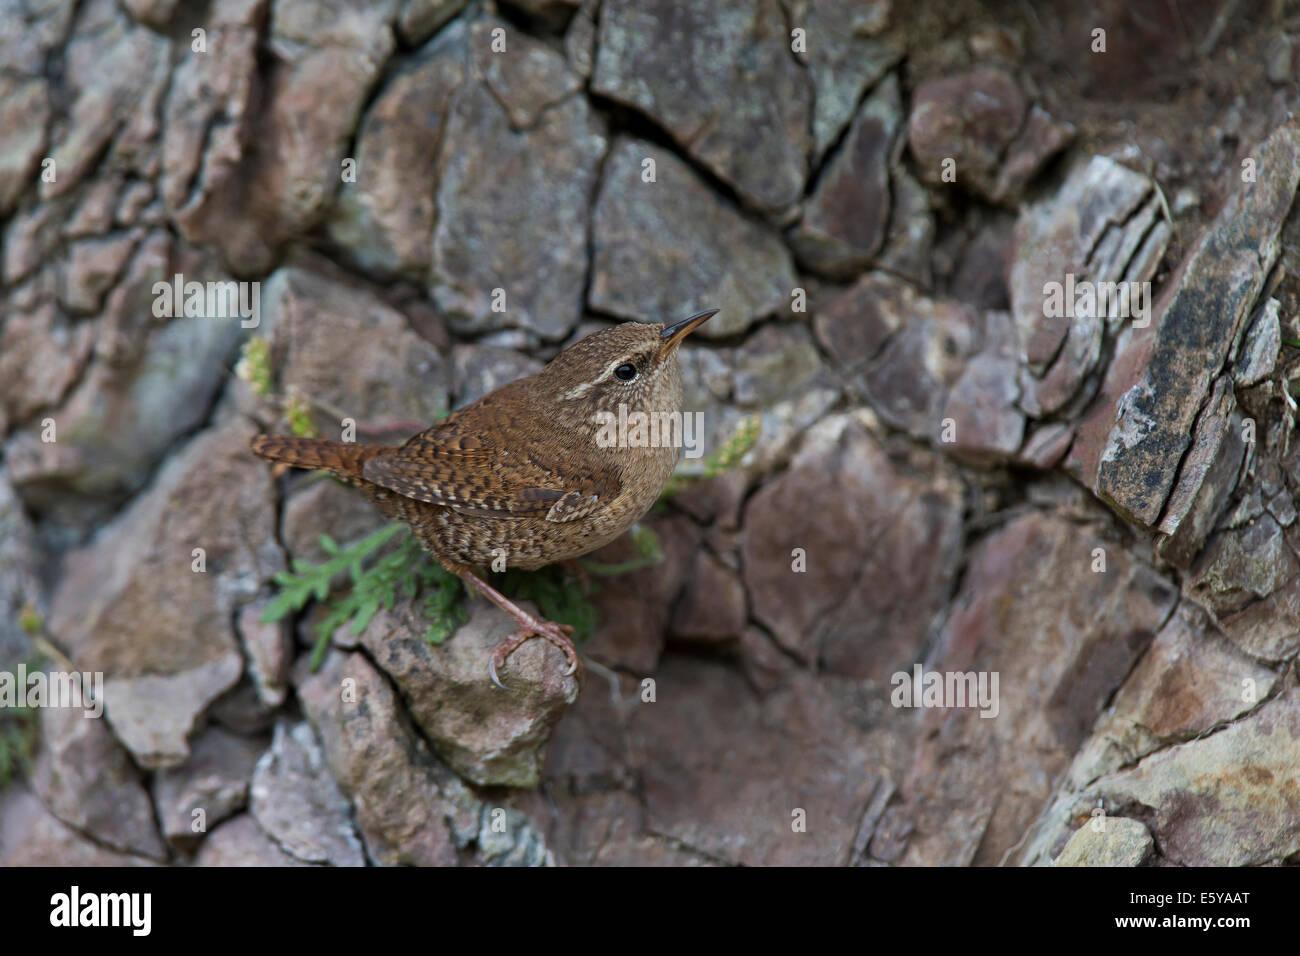 Shetland Wren, Troglodytes troglodytes zetlandicus returning to nest - Stock Image